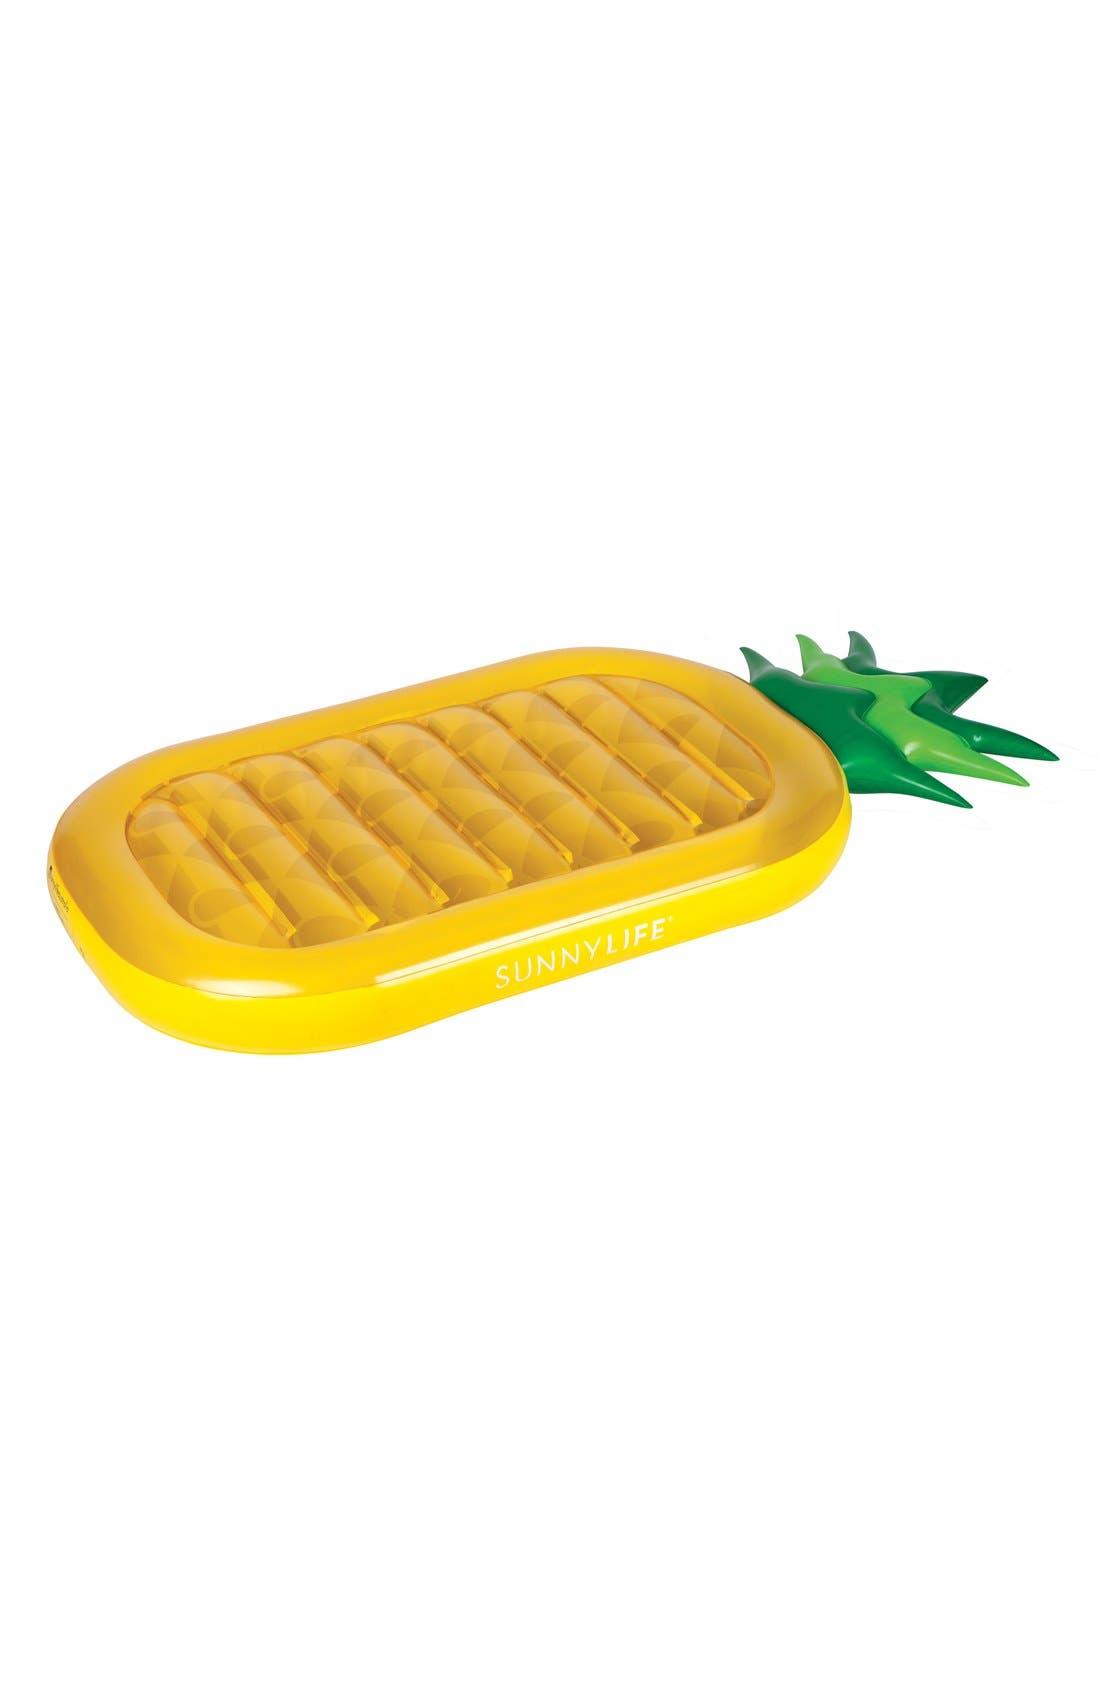 Alternate Image 3  - Sunnylife 'Really Big' Inflatable Pineapple Pool Floatie